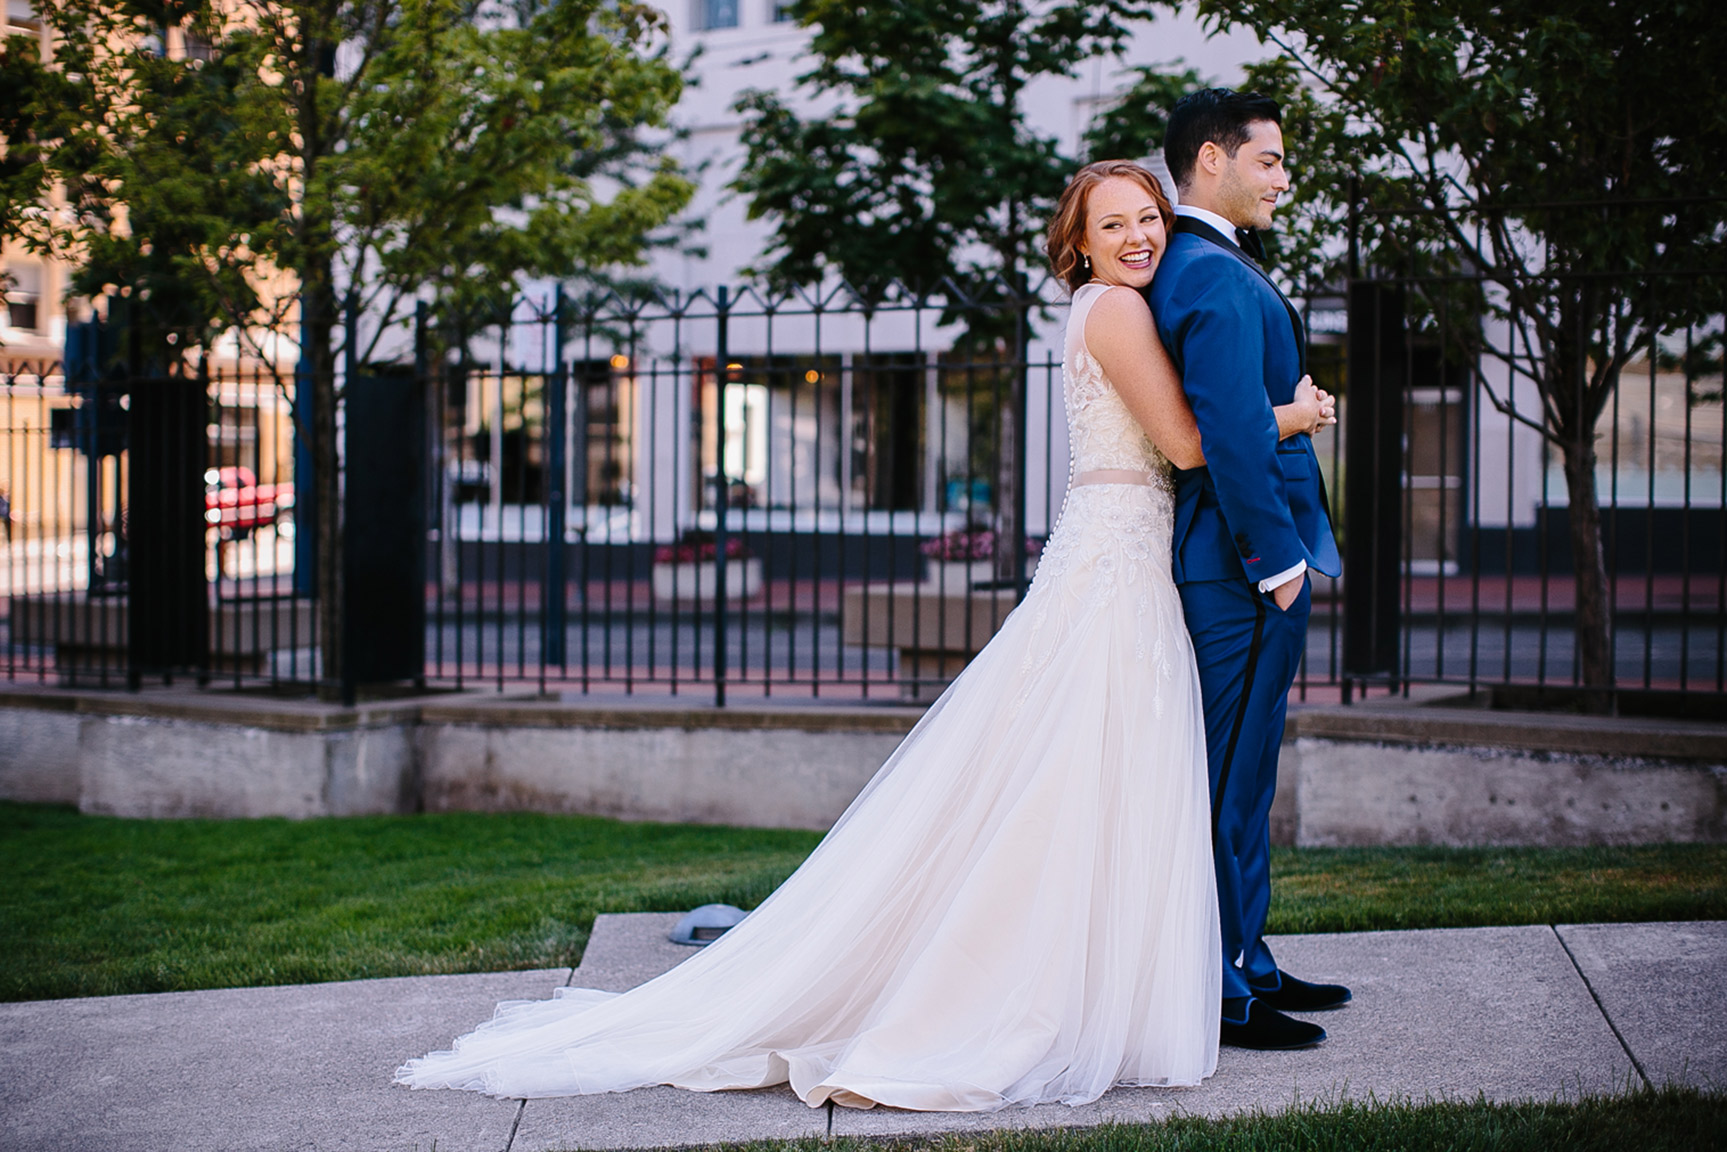 Portland_WeddingPhotographer_007.jpg